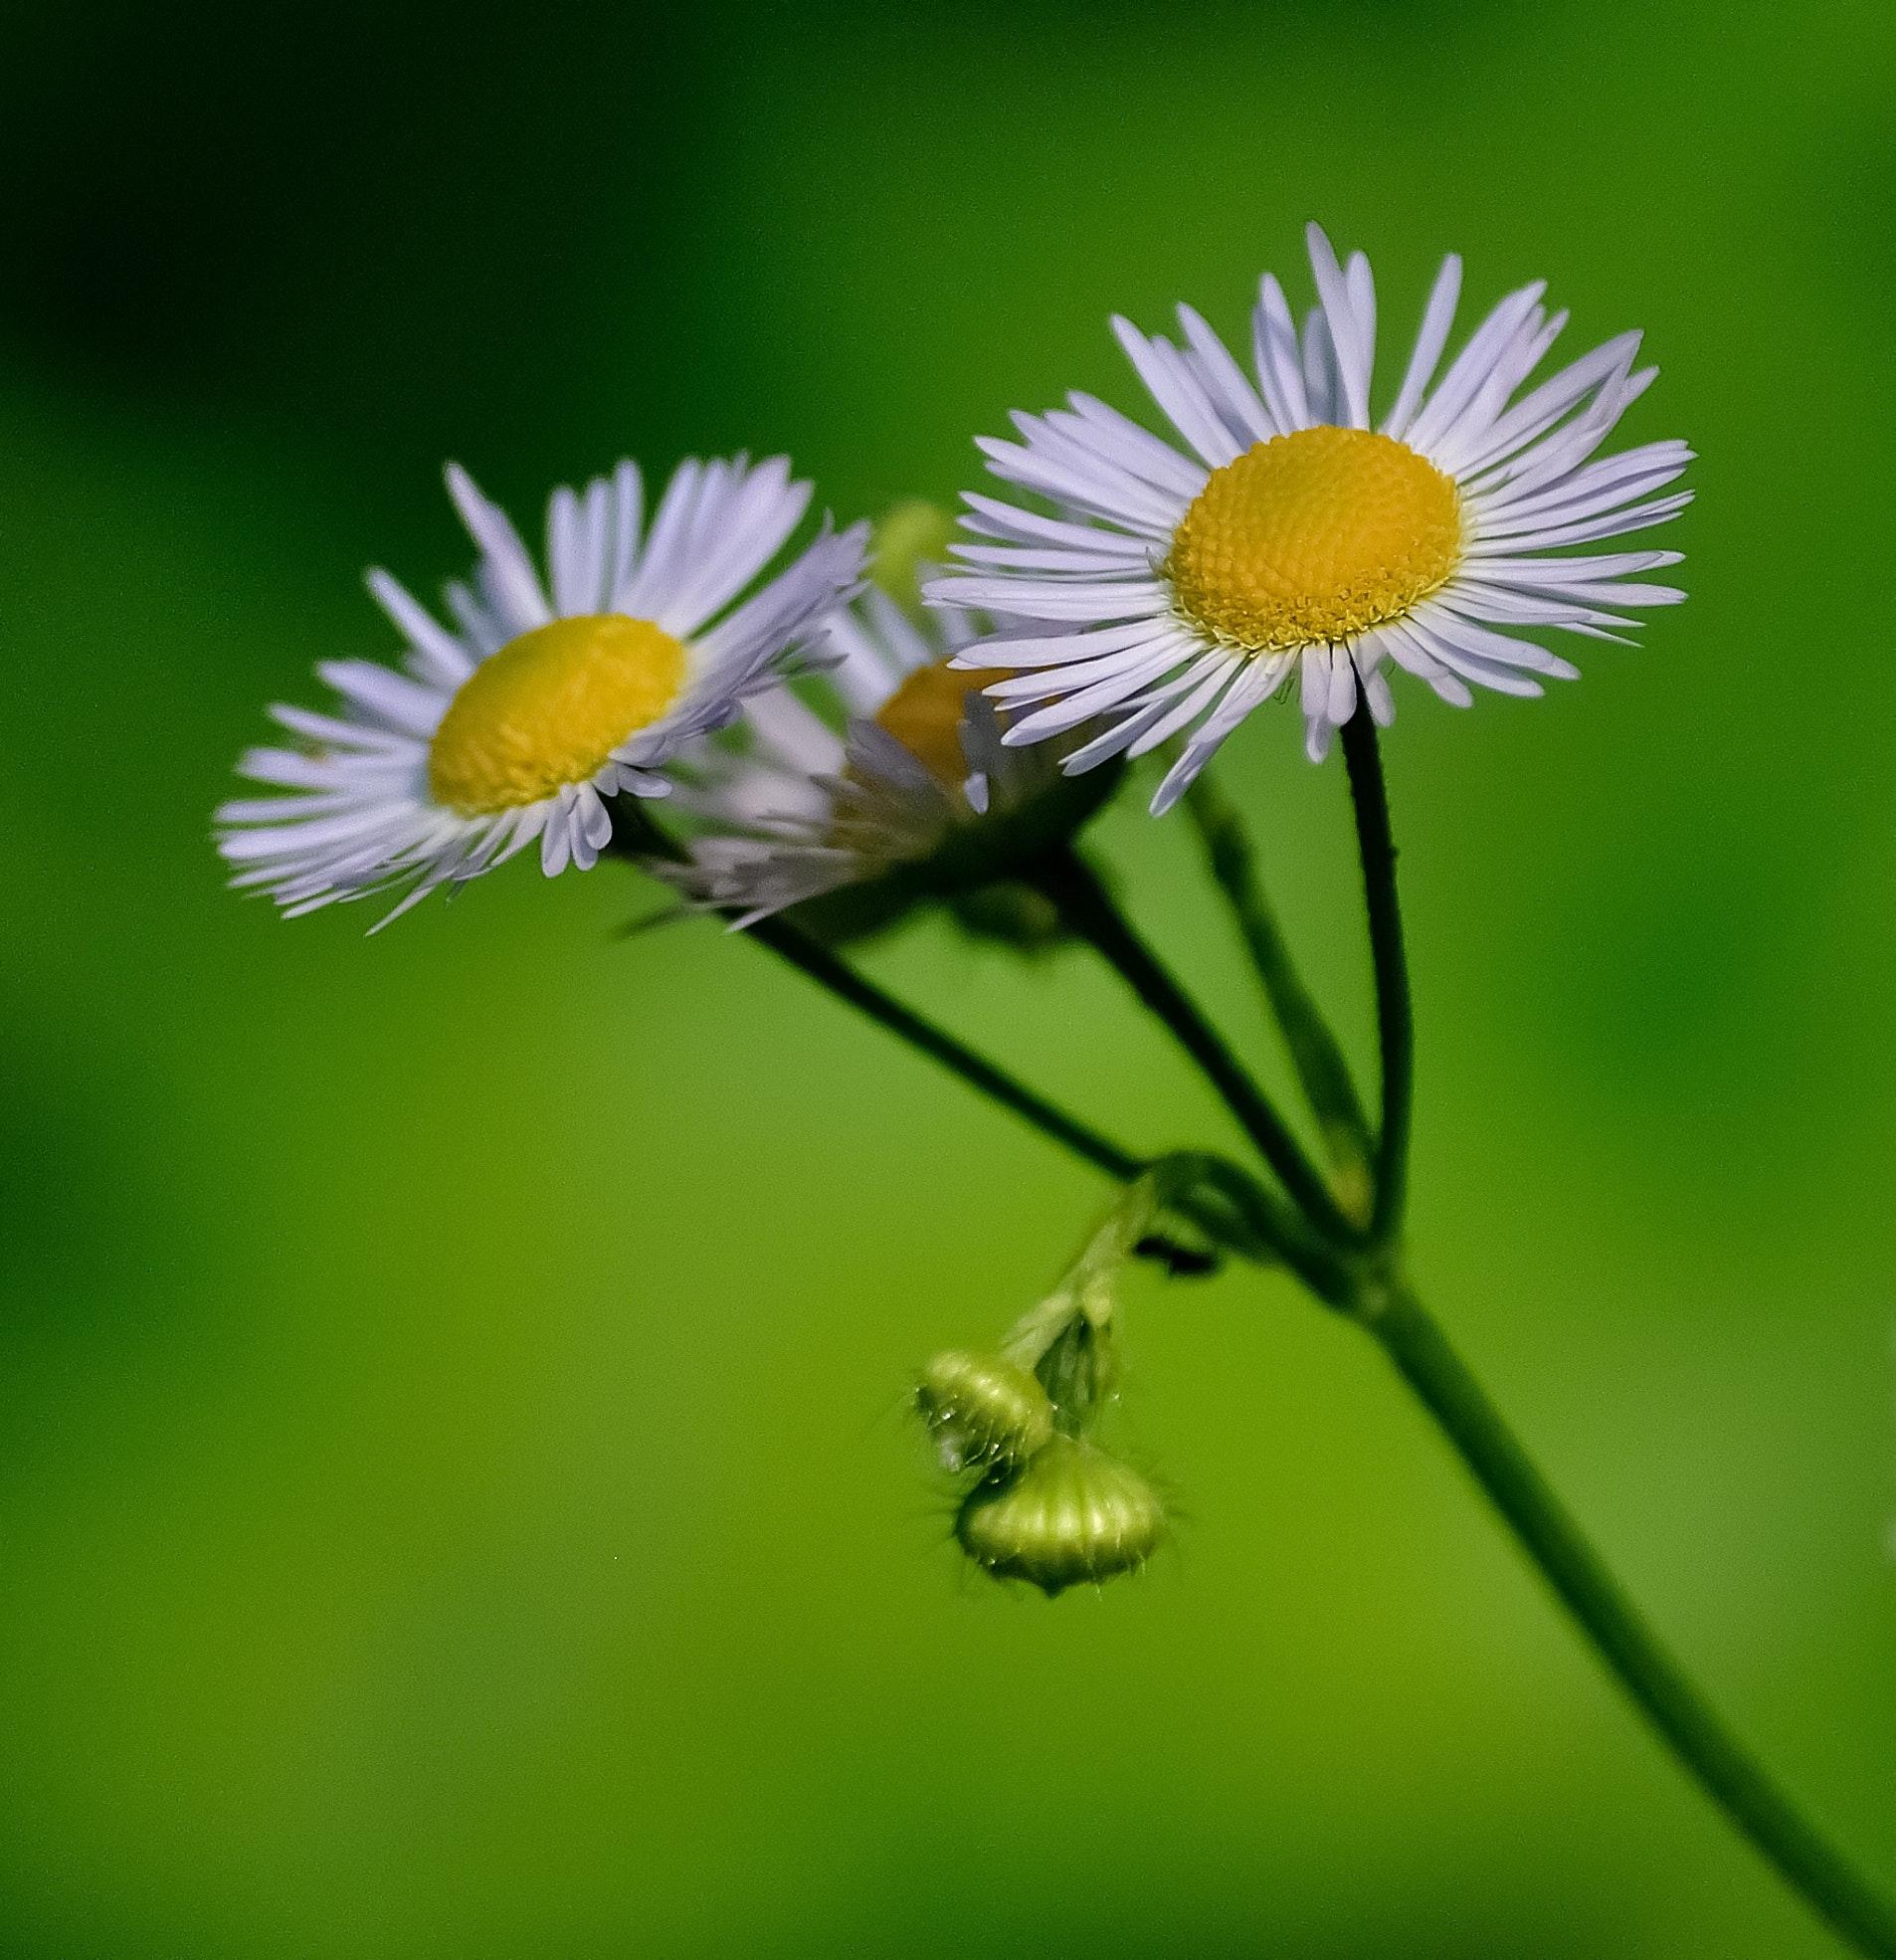 Selective focus photo of daisy flowers free stock photo free download izmirmasajfo